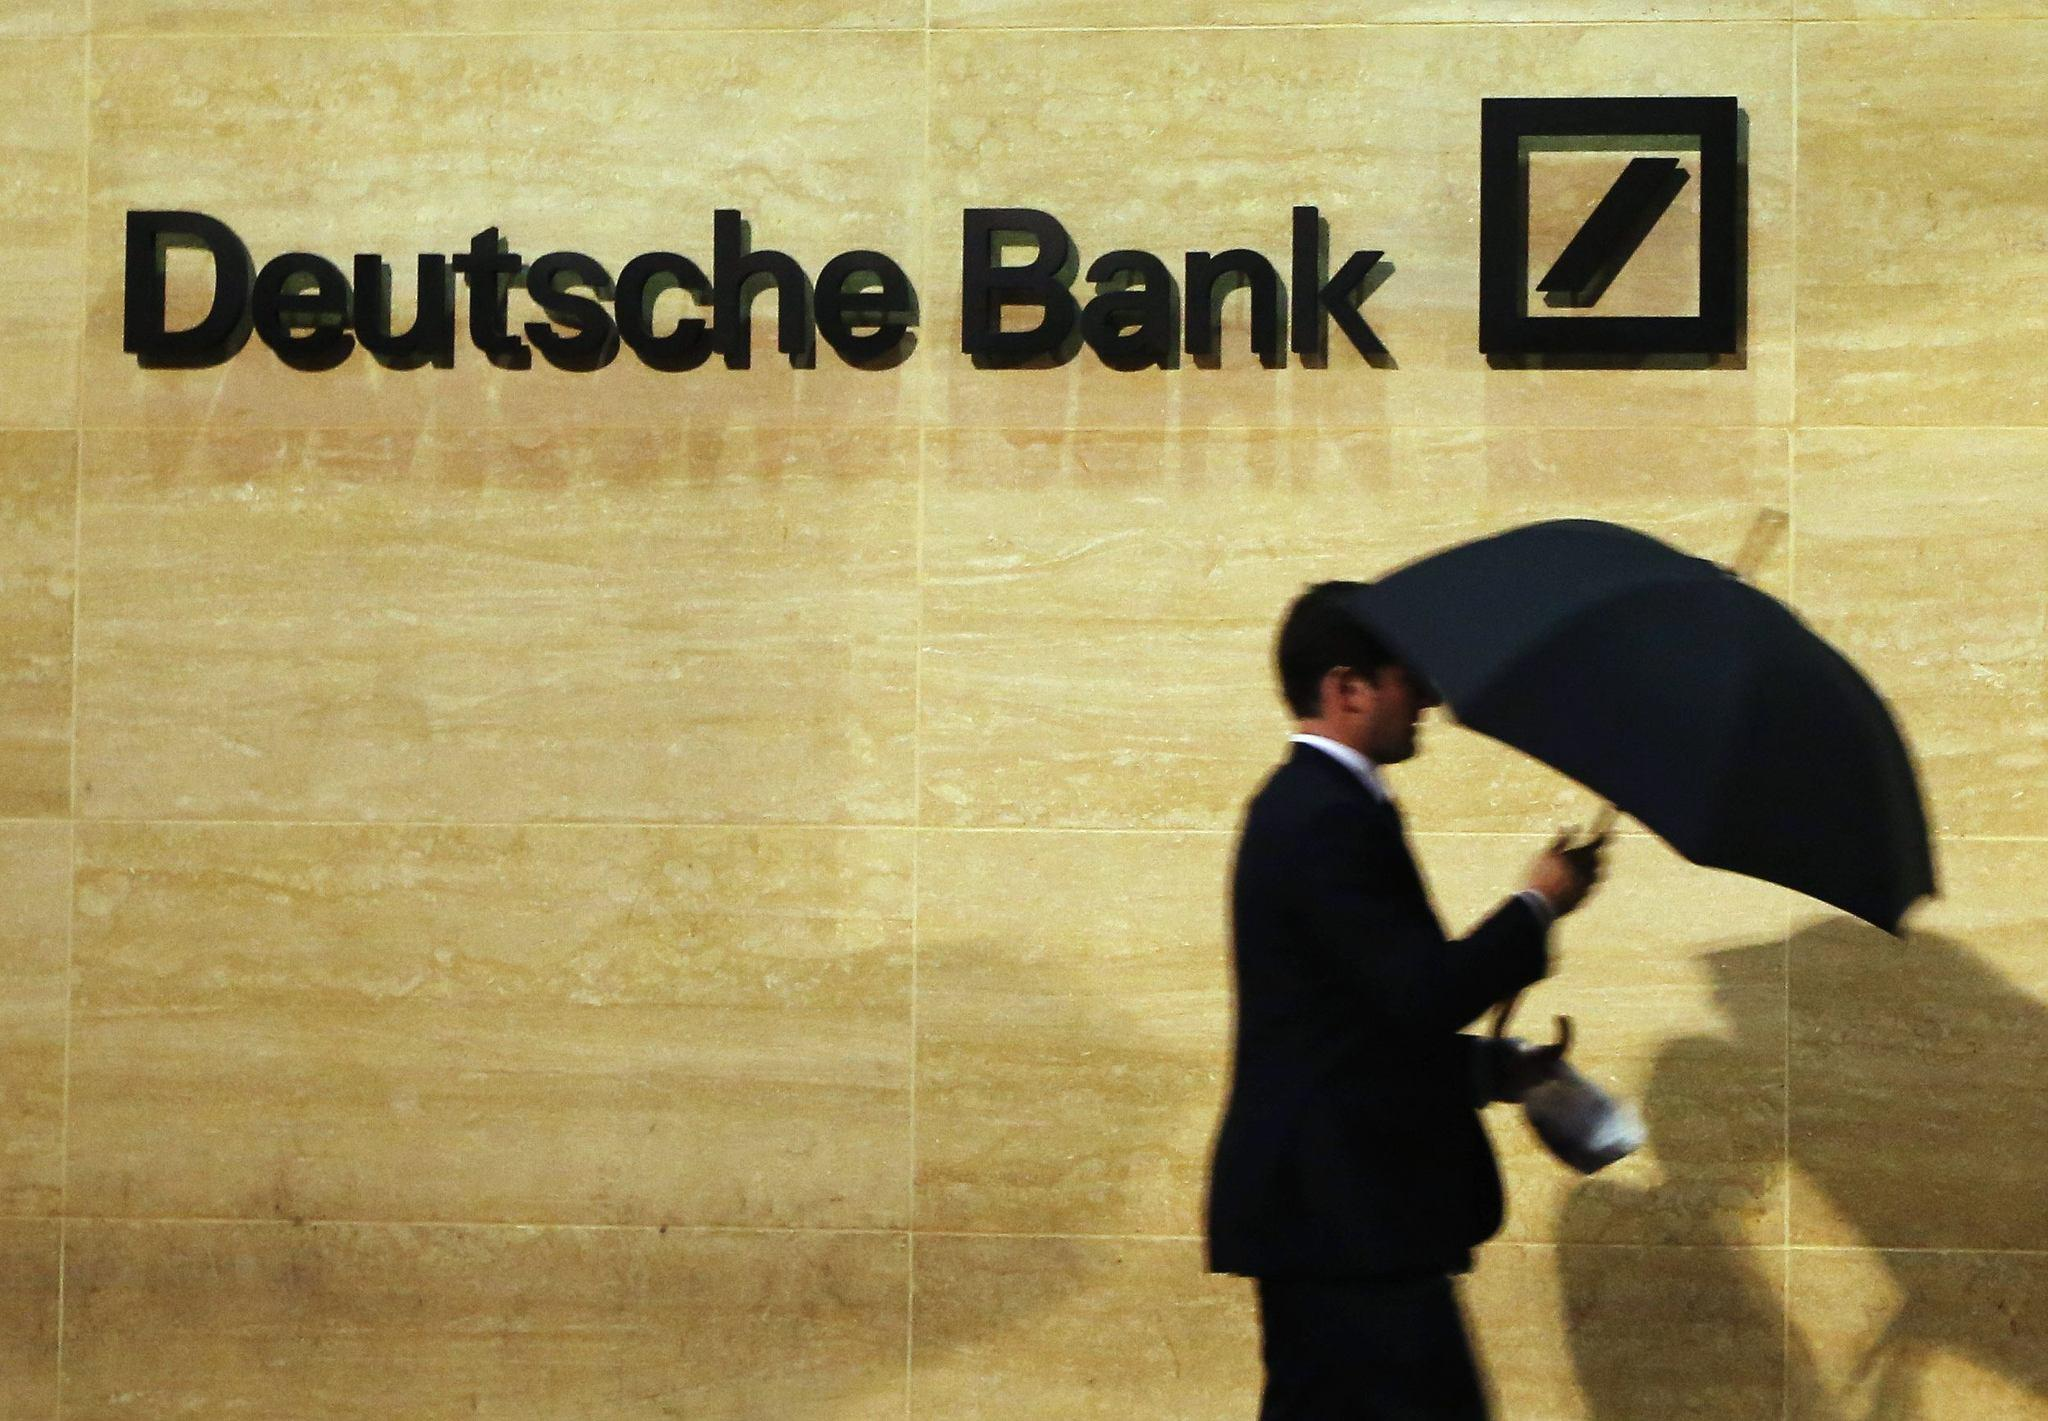 A man walks past Deutsche Bank offices in London on Dec. 5, 2013.